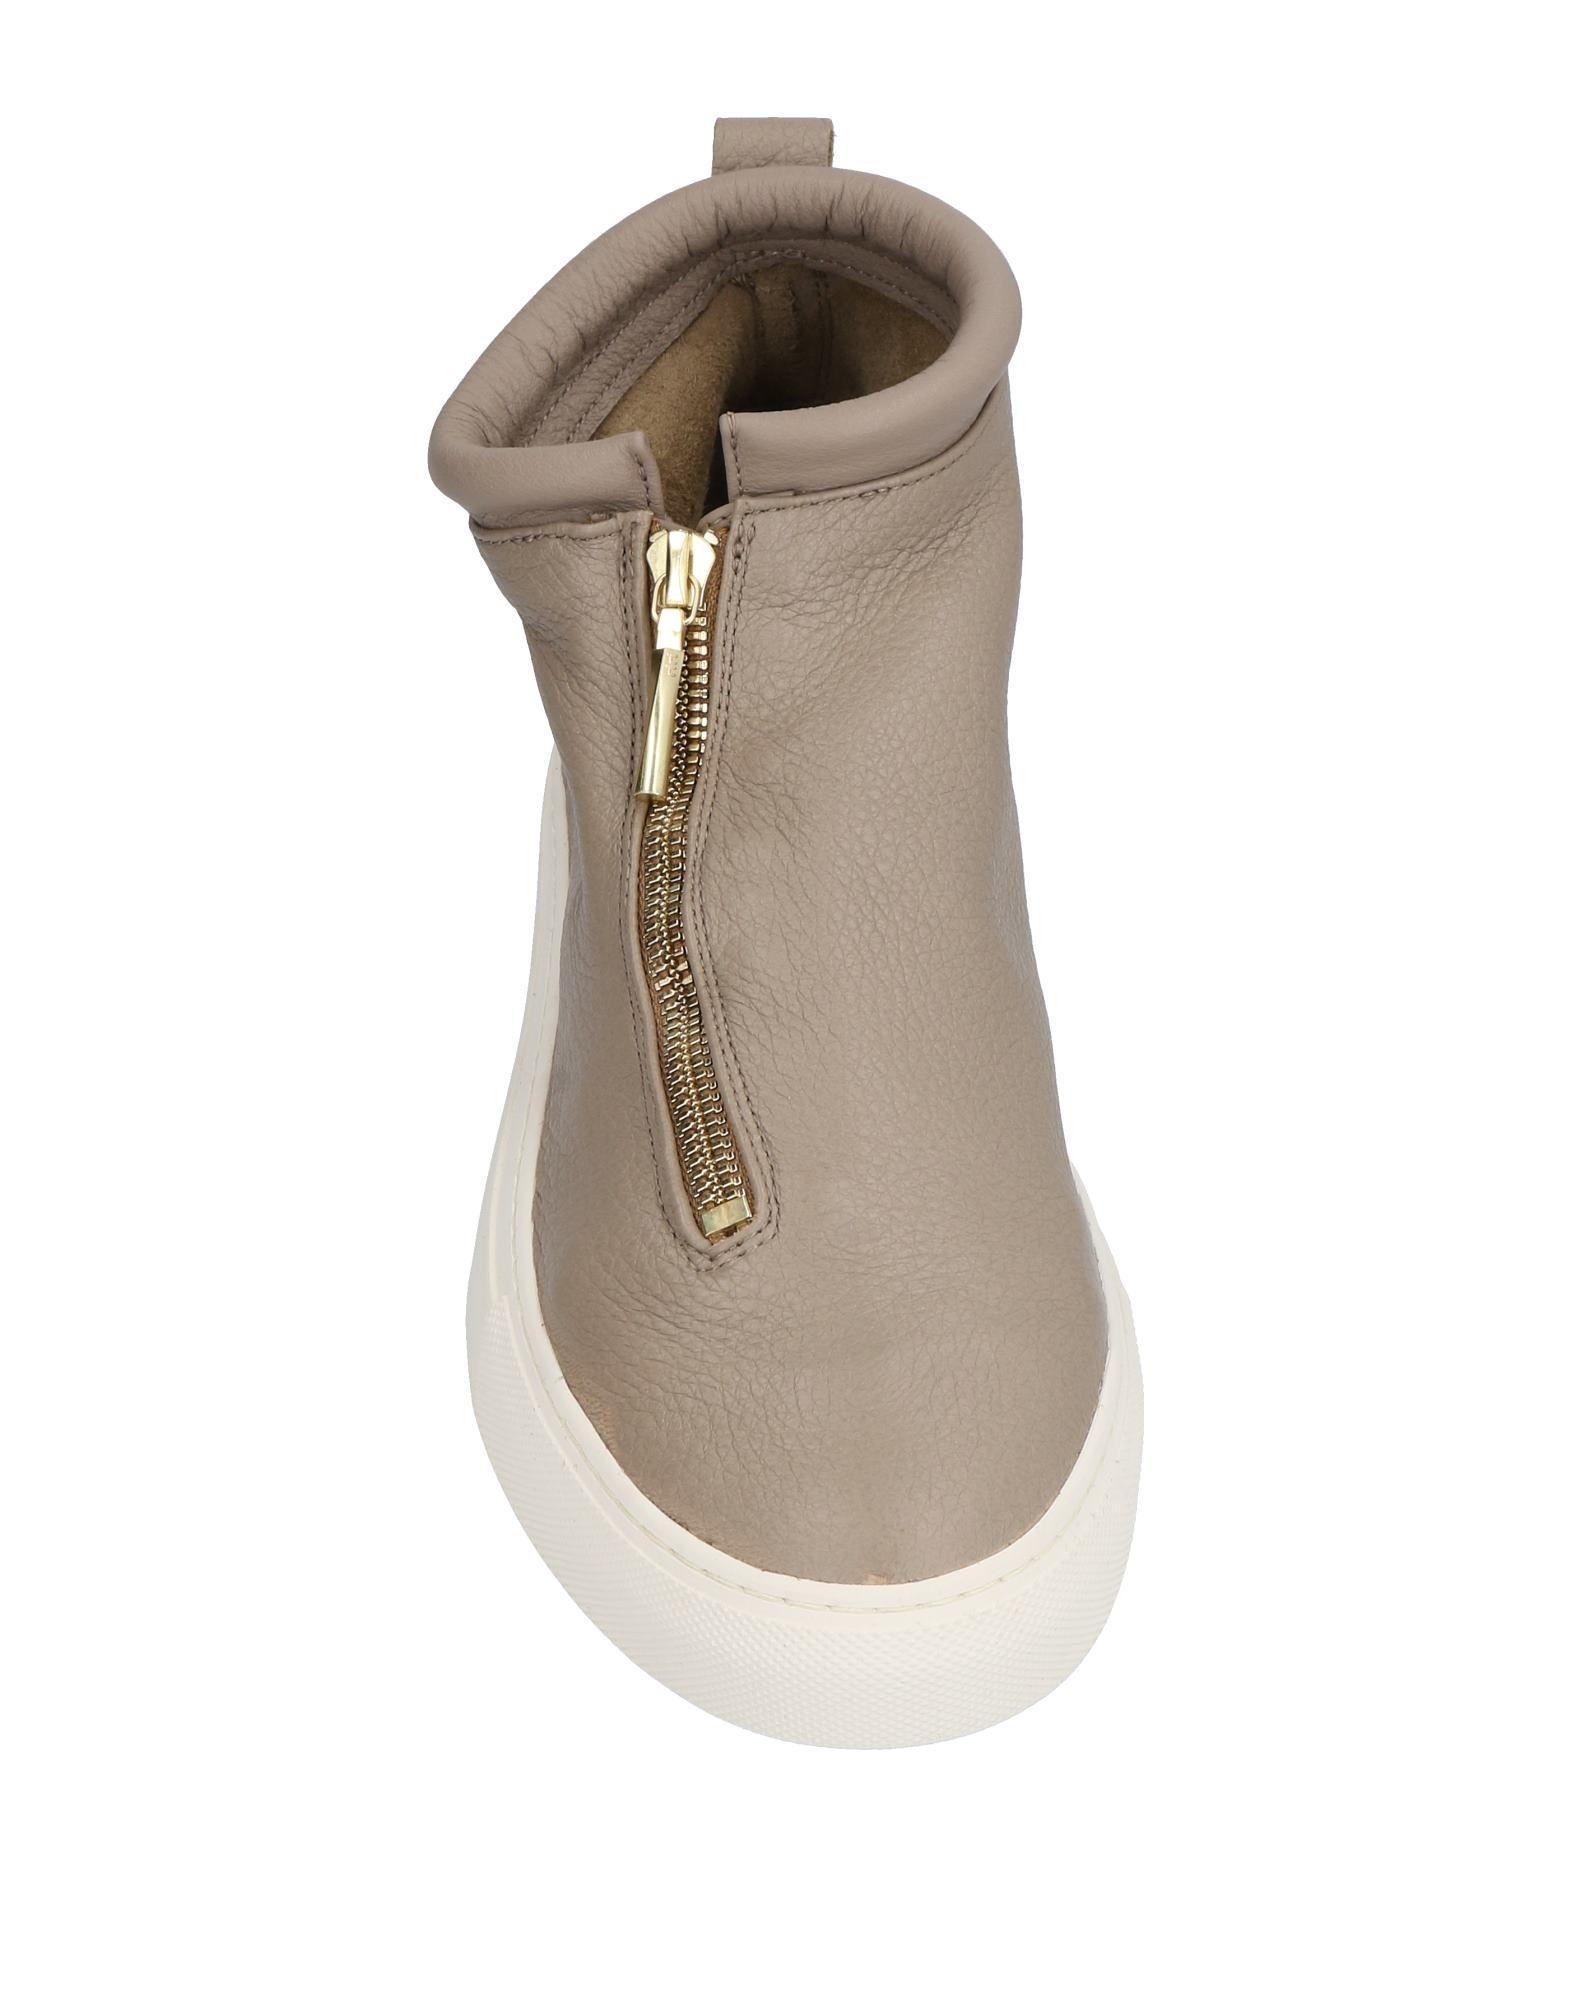 Diemme Sneakers Herren Qualität  11500603TI Gute Qualität Herren beliebte Schuhe 6c2b0d